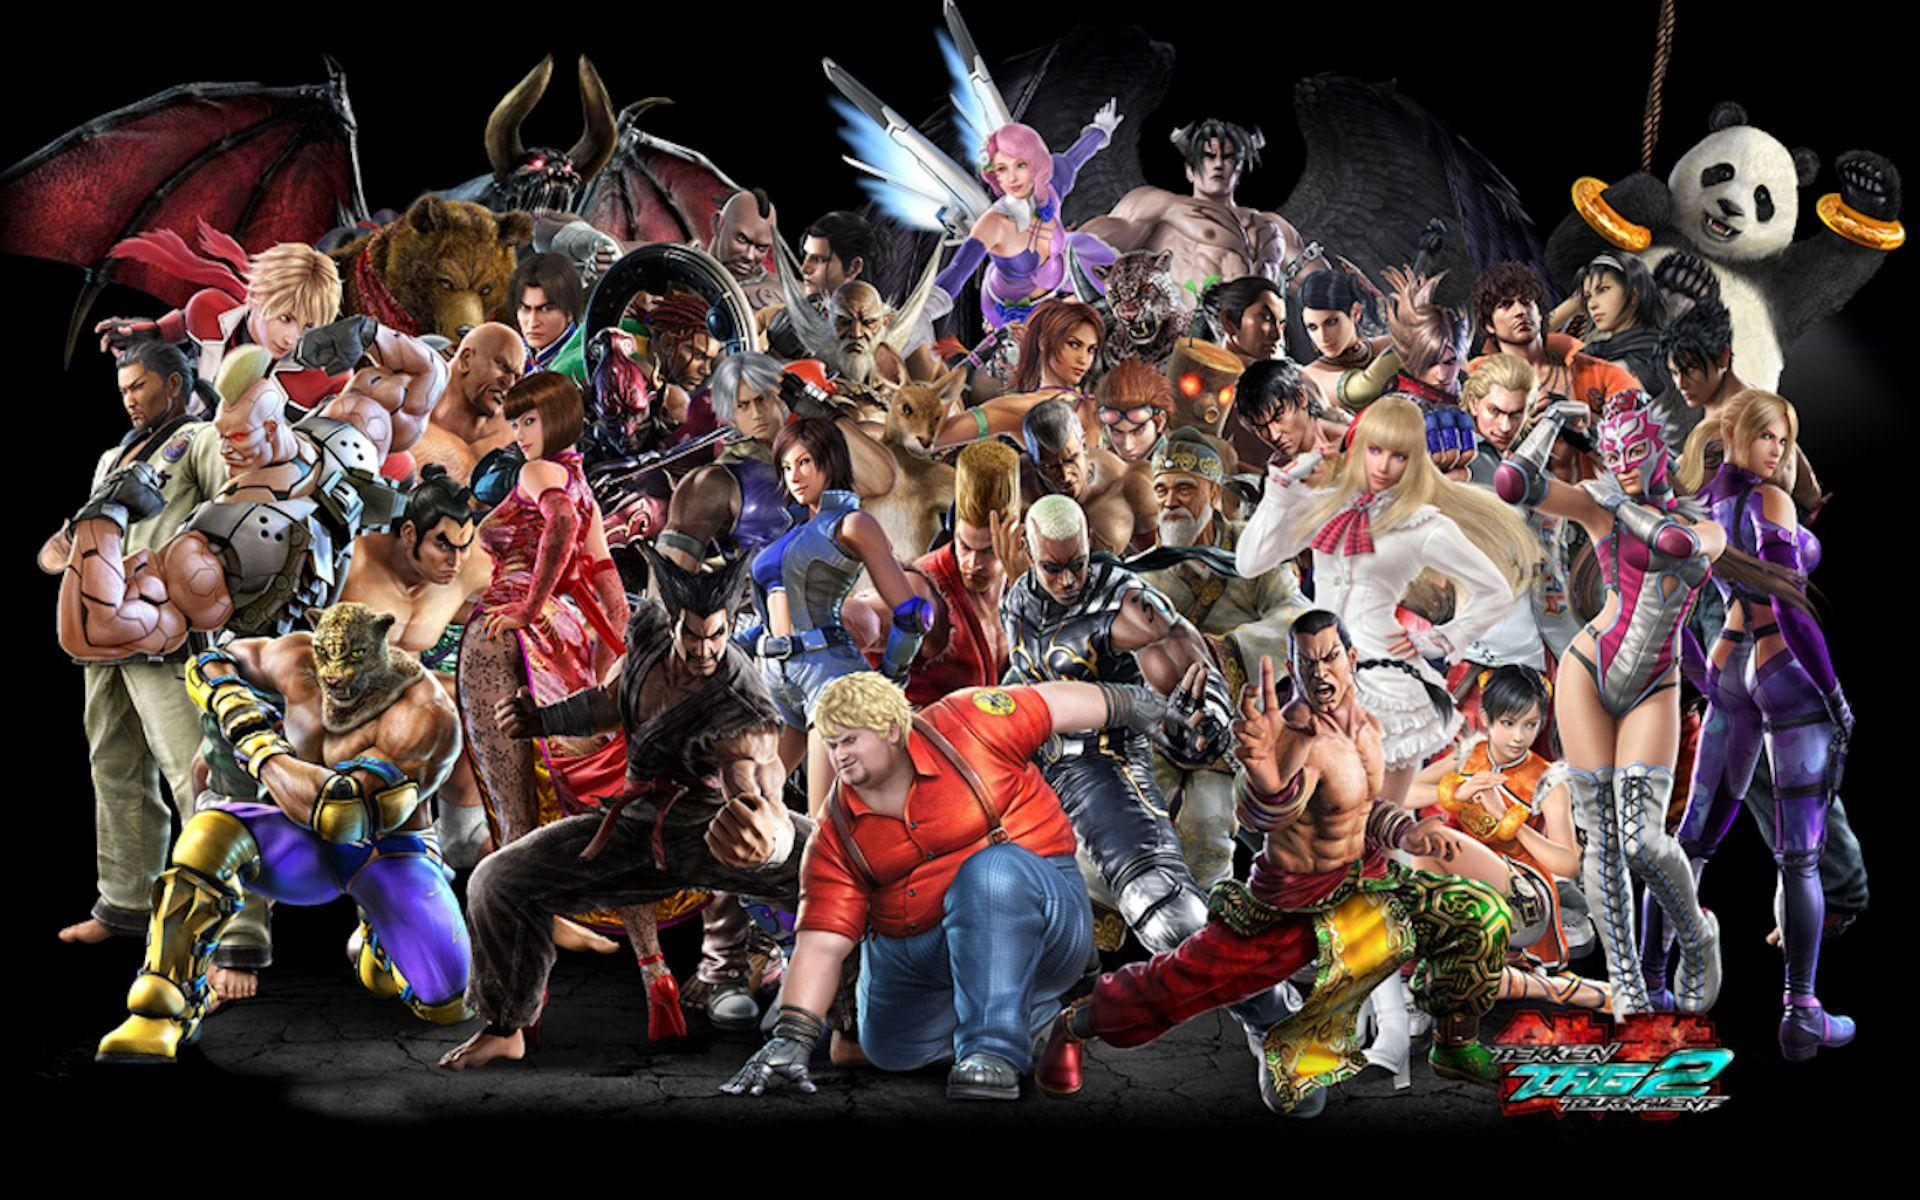 Tekken The Best 3d Fighting Game Series Tekken Tag Tekken Tag Tournament 2 Character Wallpaper